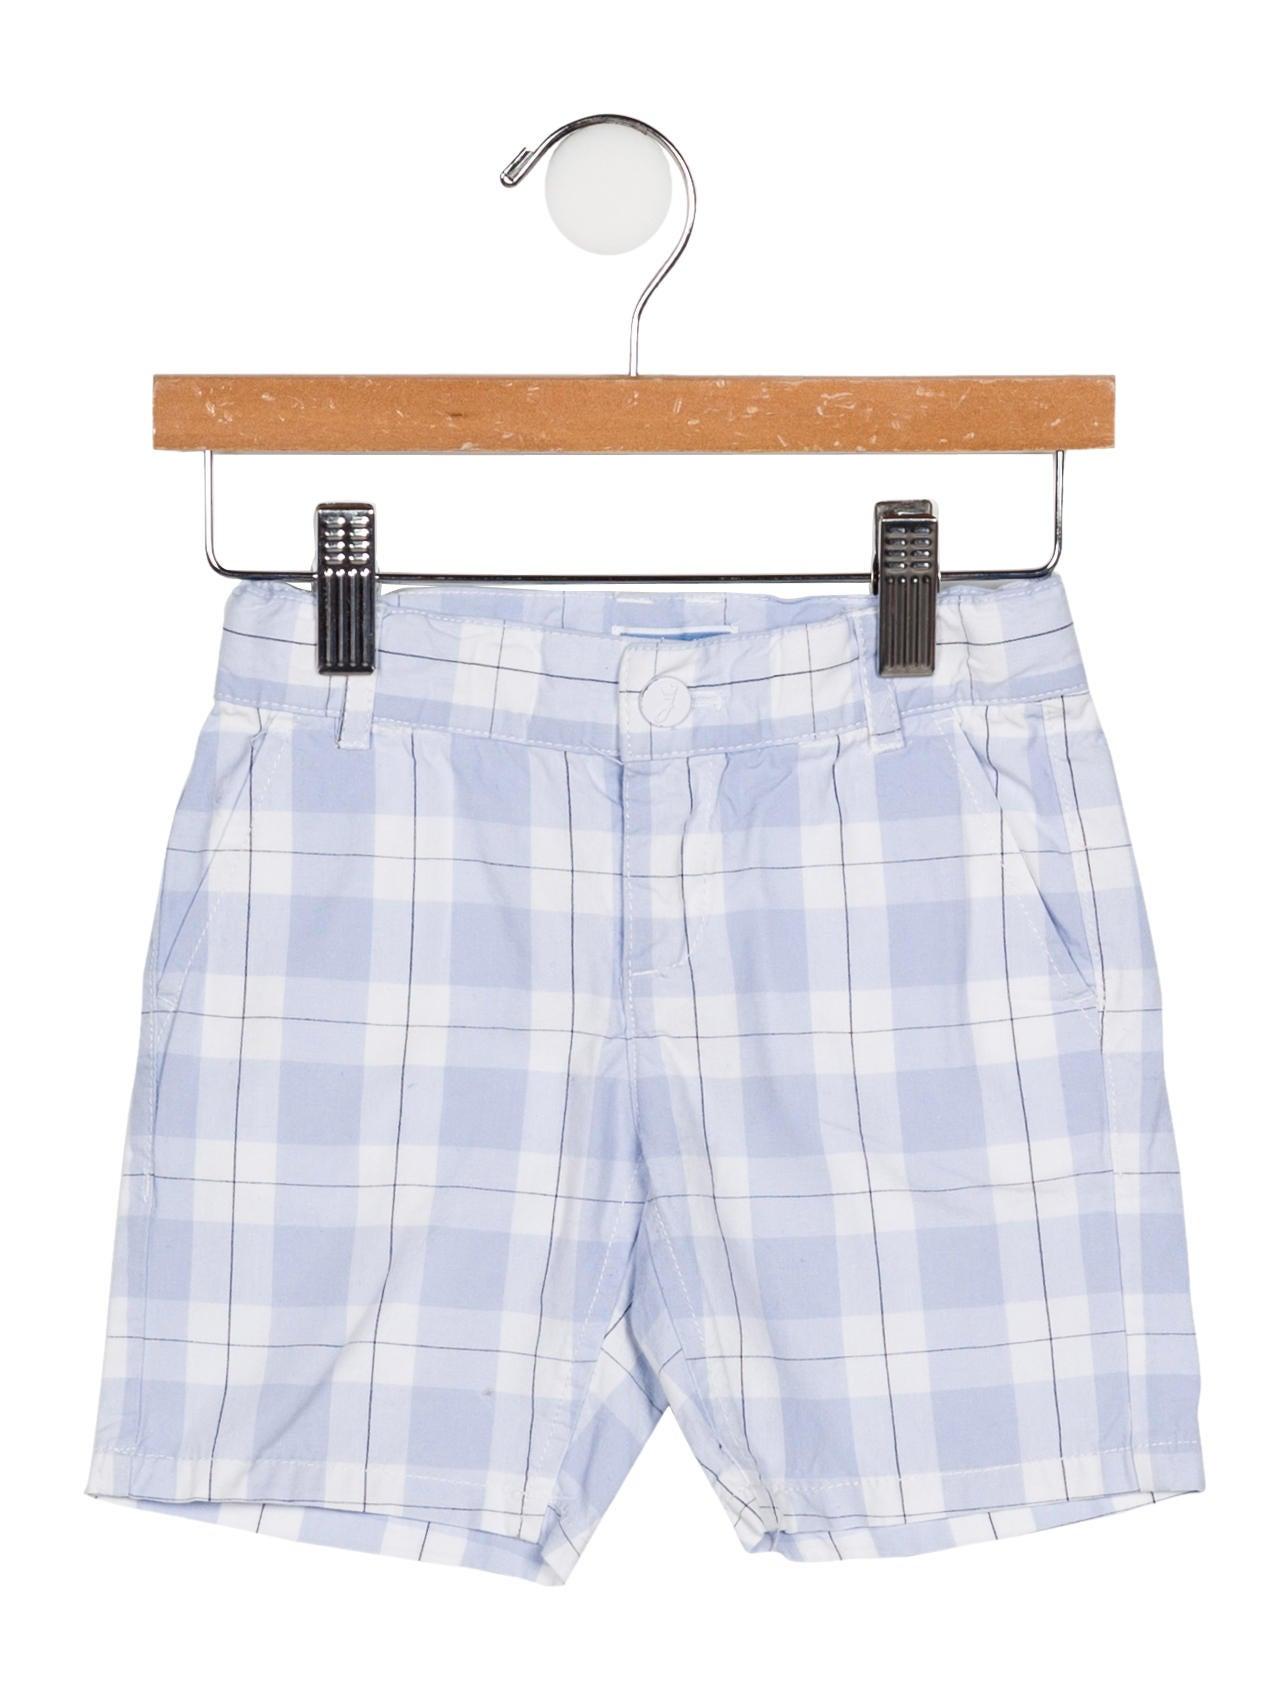 2c83828778a26 Jacadi Boys' Plaid Shorts - Boys - WJDCI25359 | The RealReal